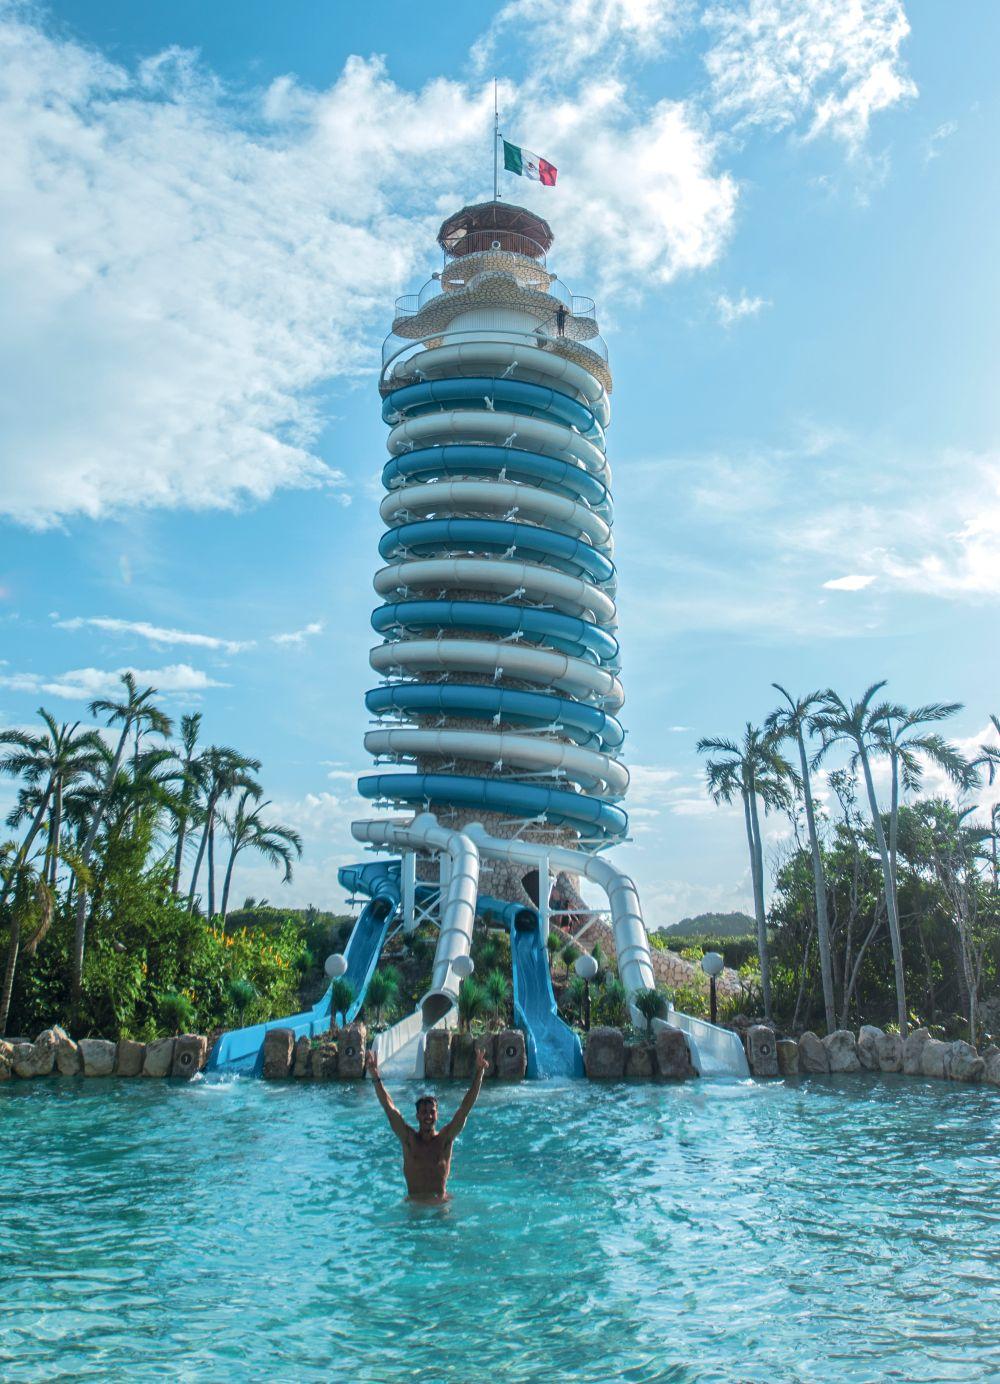 Hotel xcaret mexico cancun tui for Oficina xcaret cancun